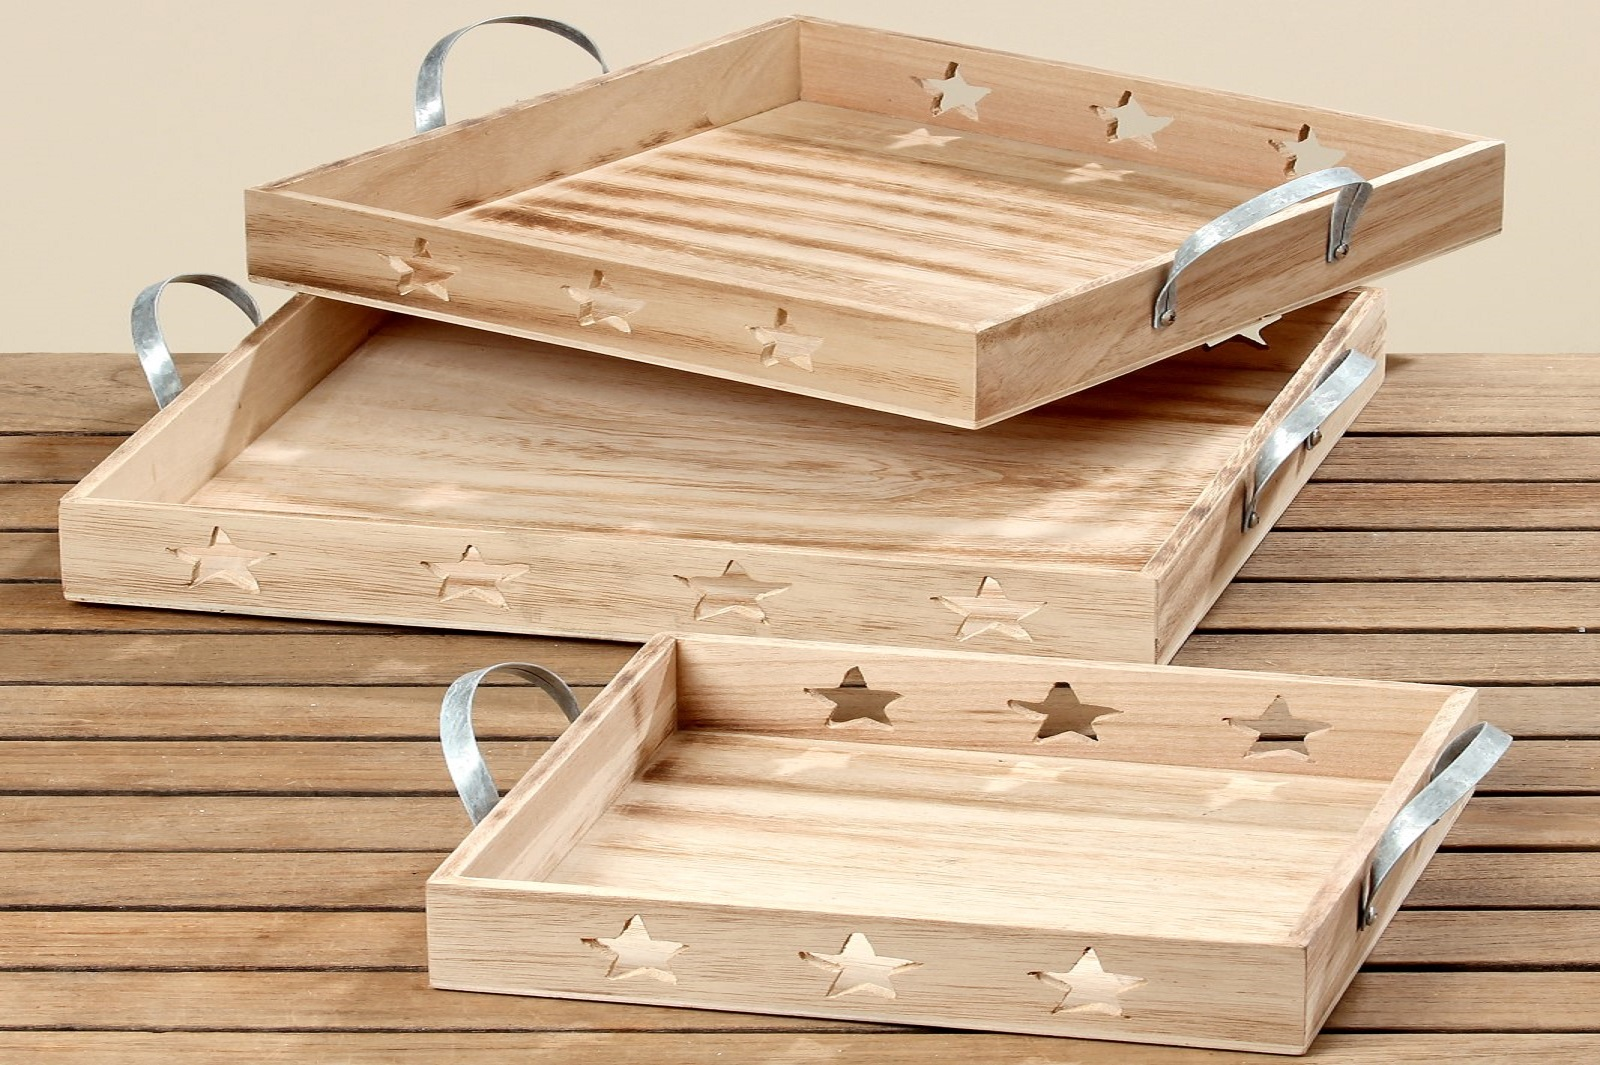 Dekotablett mit Sterne Tablett Holz natur